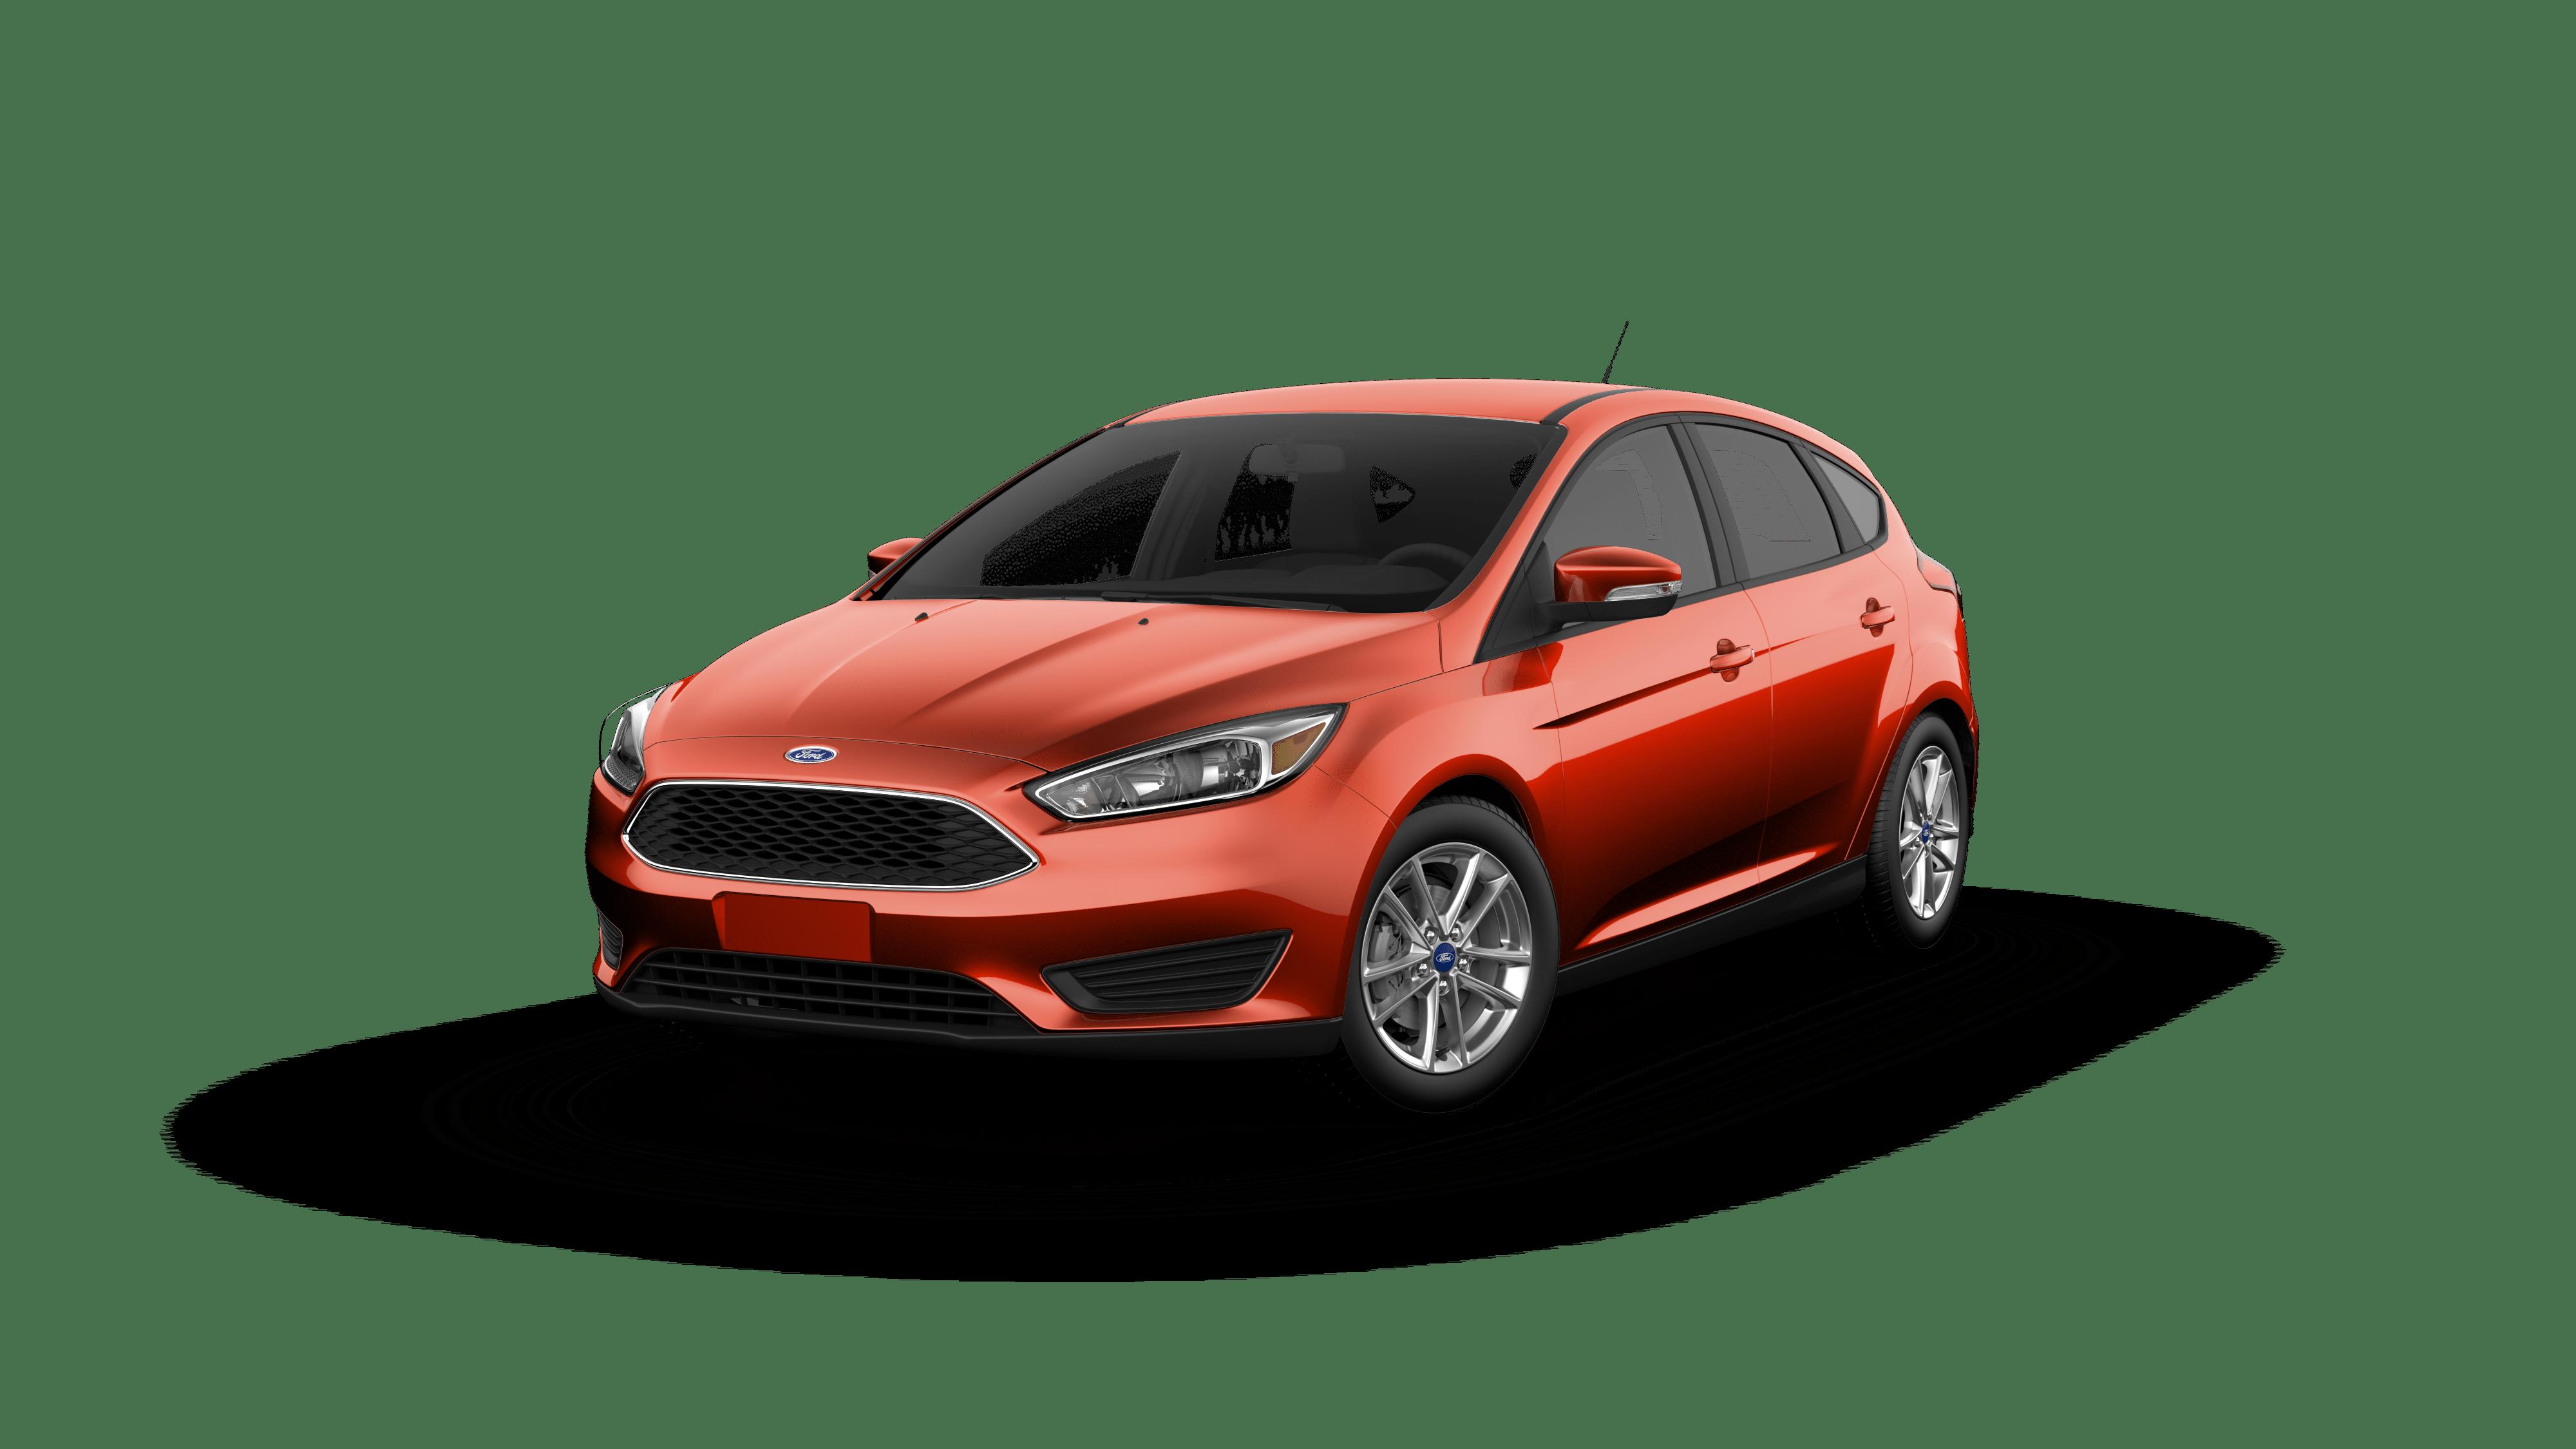 2018 Ford Focus Vehicle Photo in Sierra Vista, AZ 85635-3643